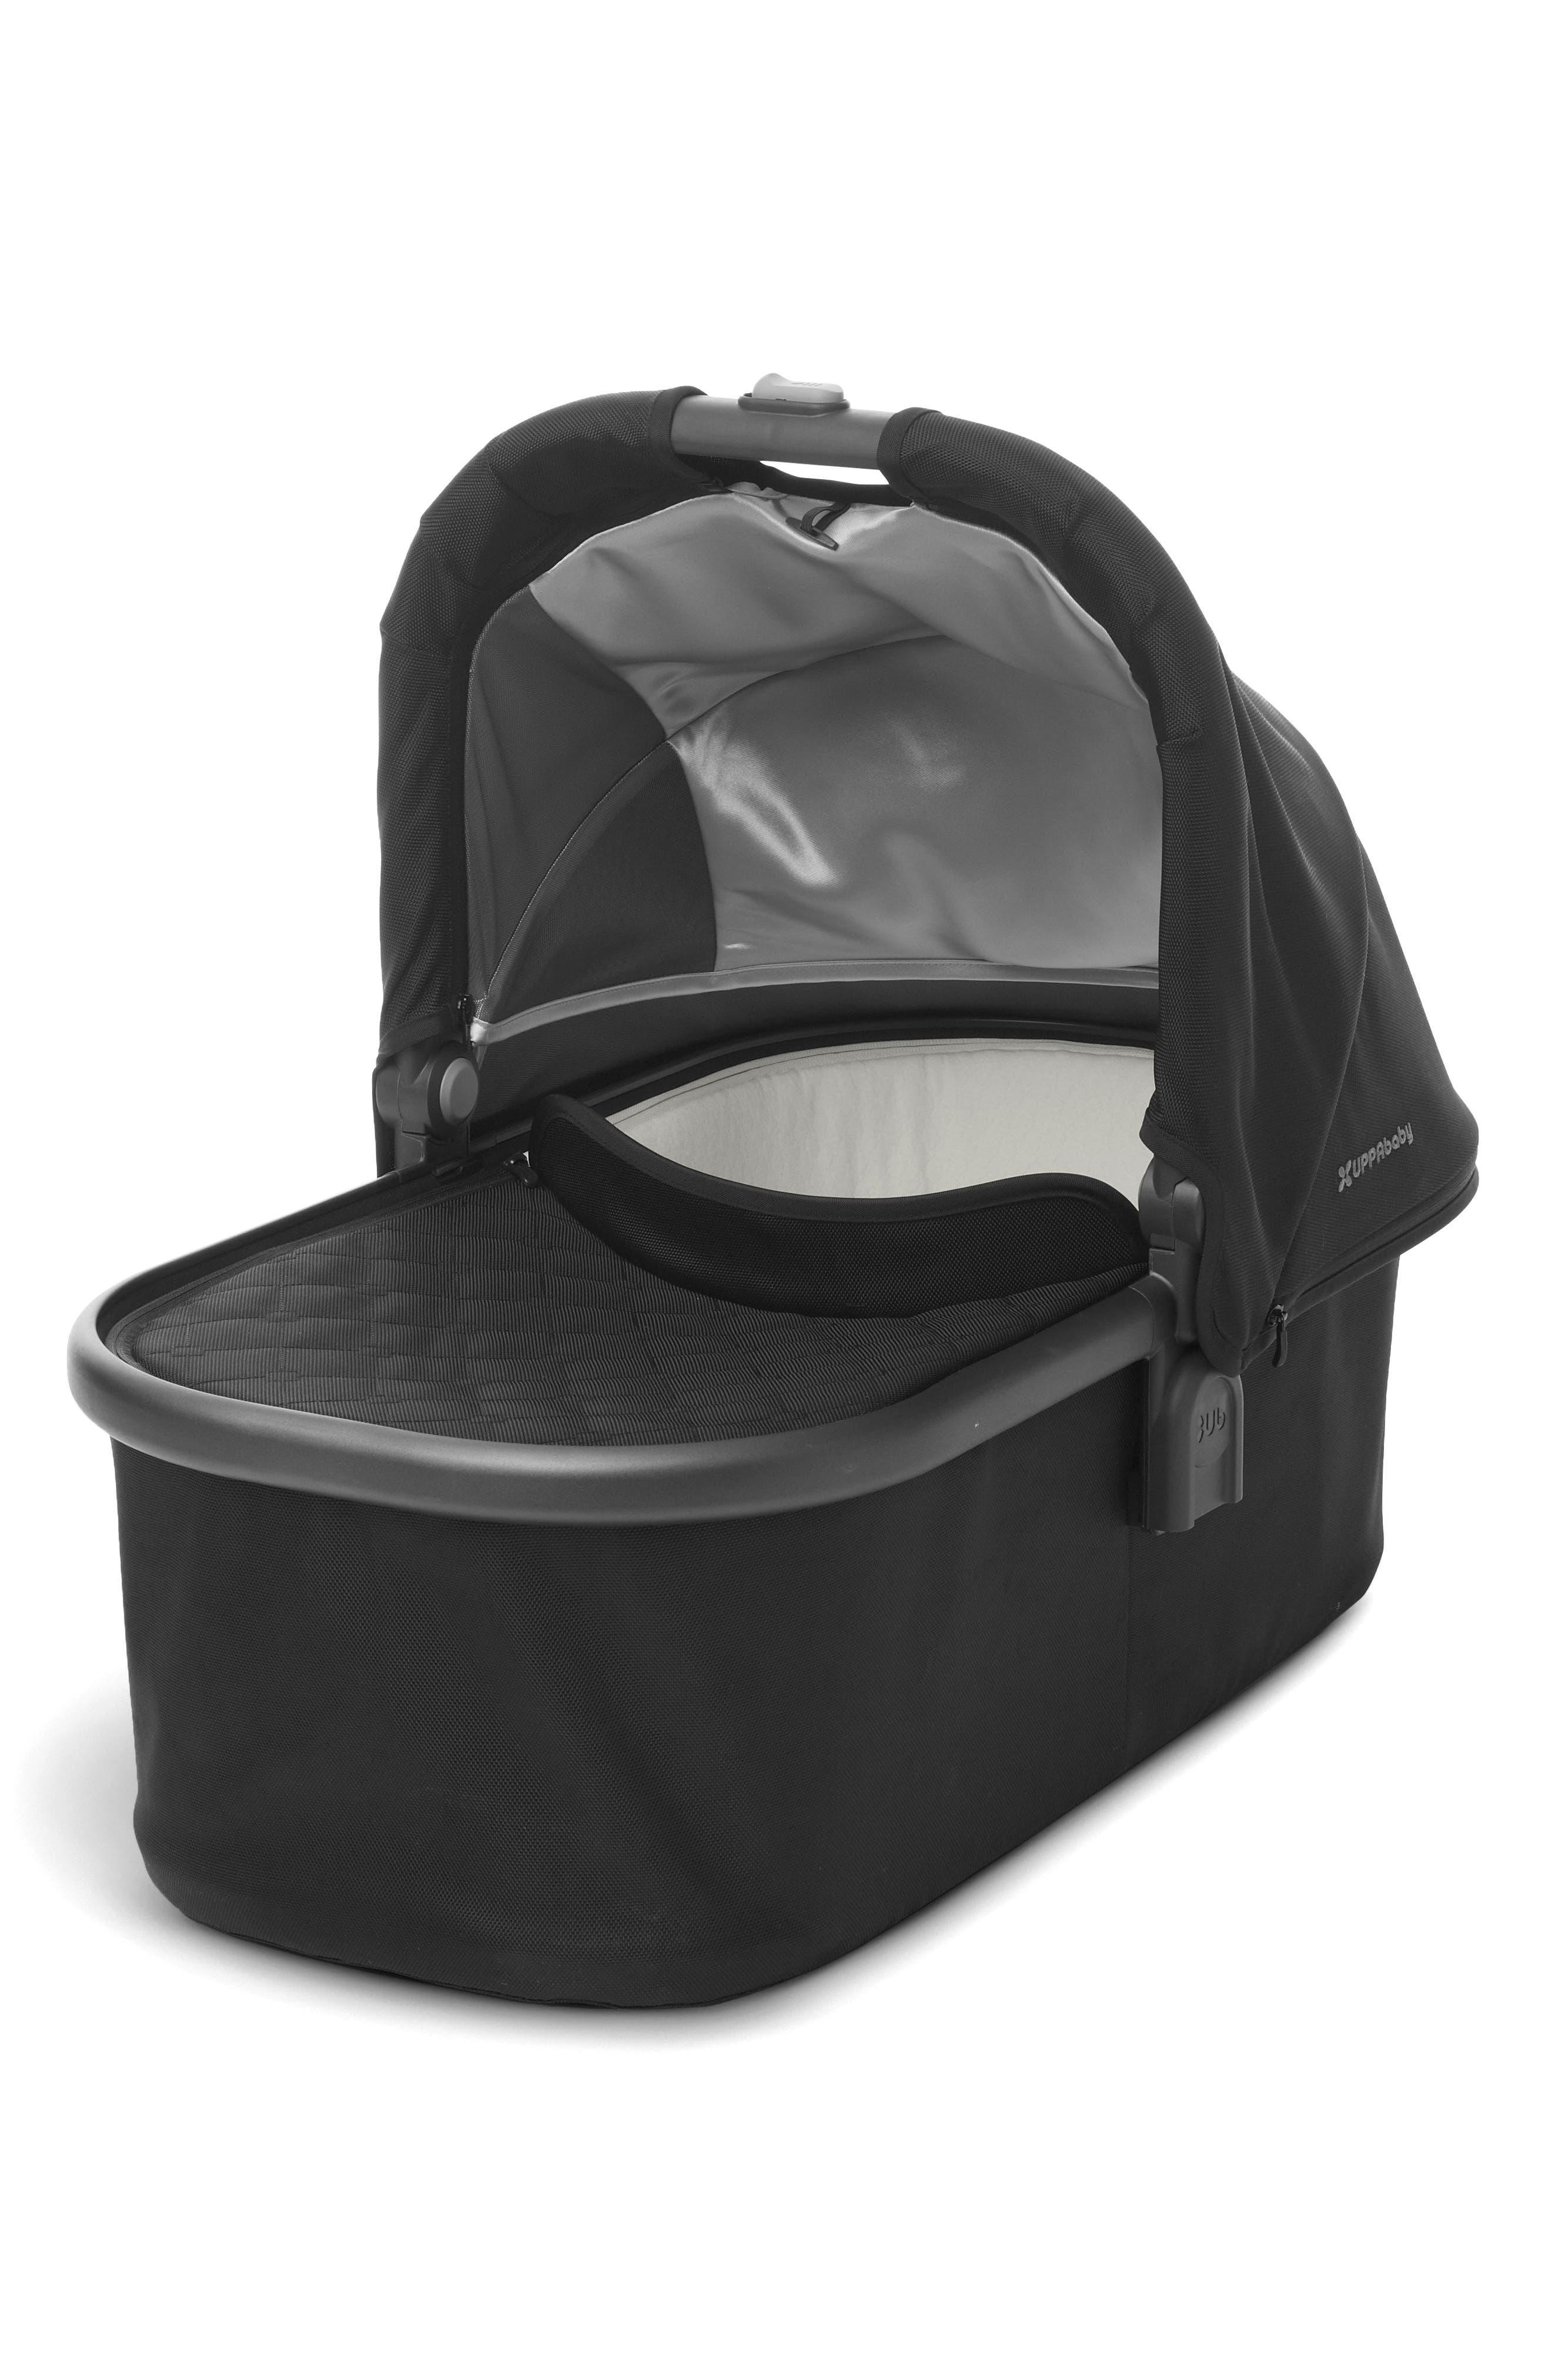 UPPAbaby Bassinet for CRUZ or VISTA Strollers